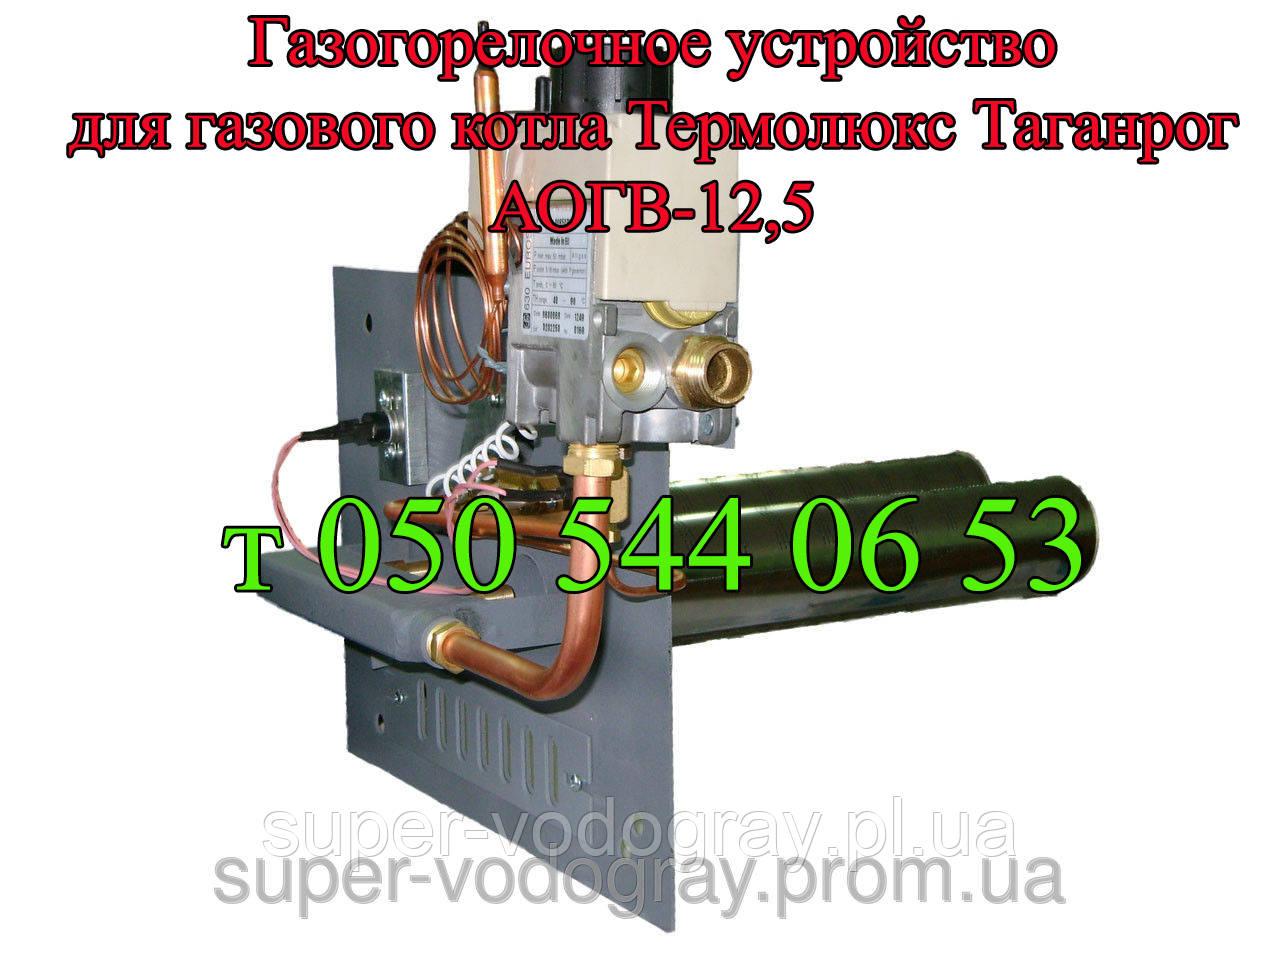 Автоматика для газового котла Термолюкс АОГВ 12,5 (Таганрог)